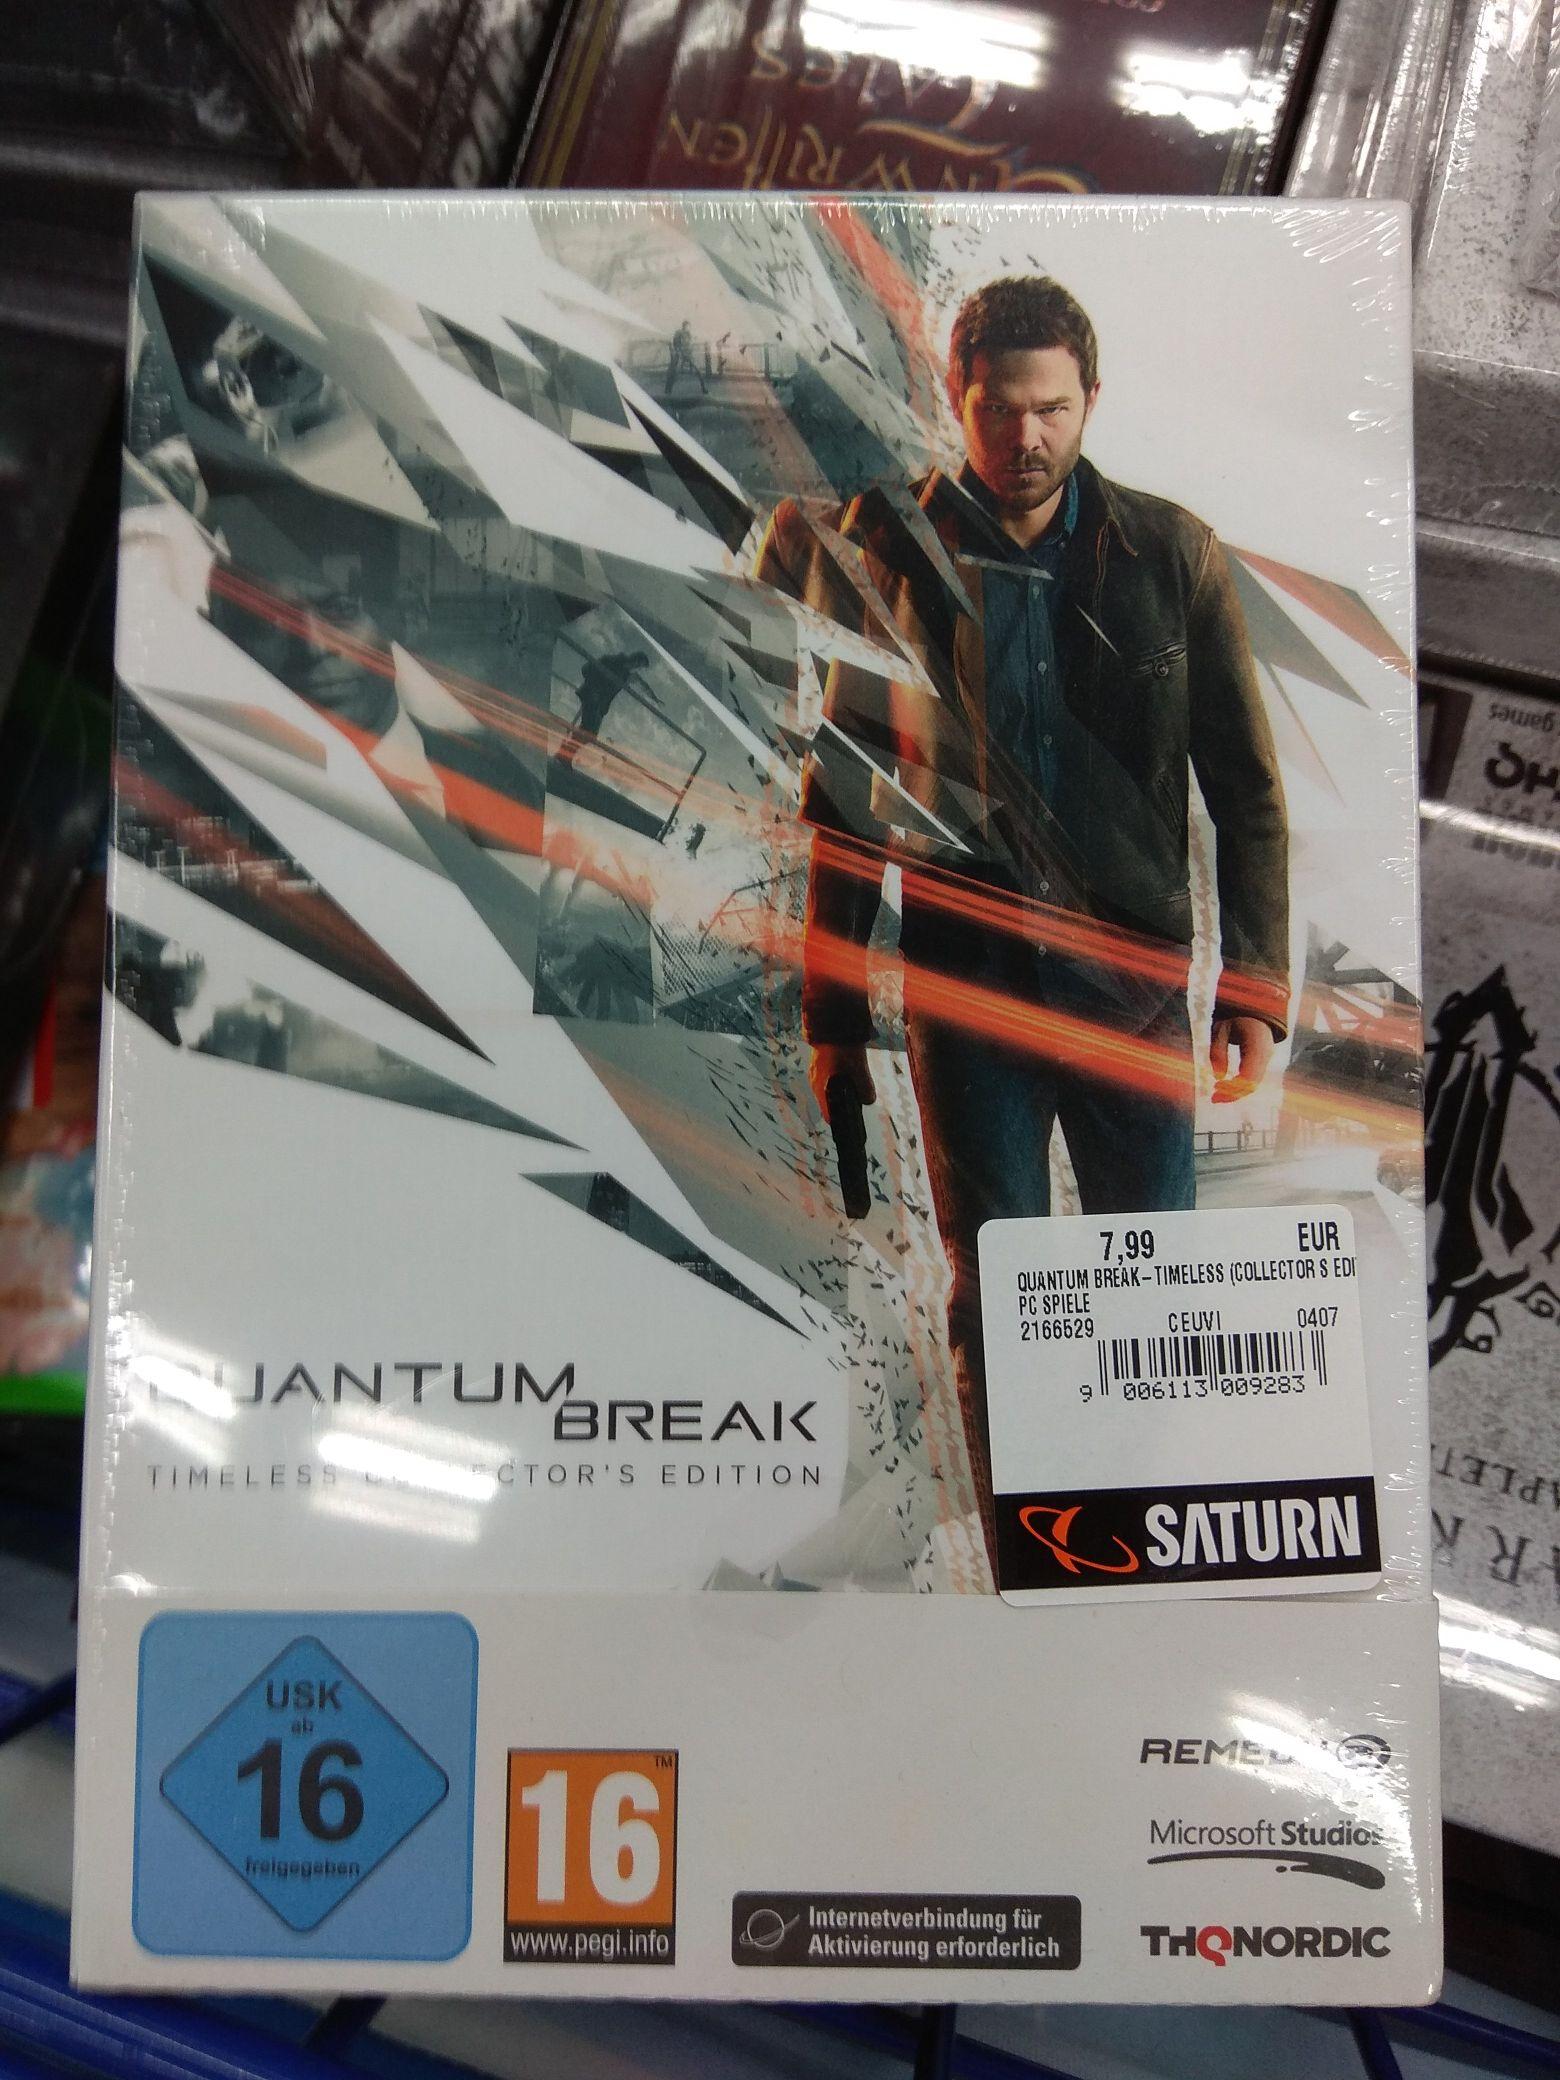 [Lokal Berlin] Quantum Break (PC) - Timeless Collector's Edition - Saturn am Alex